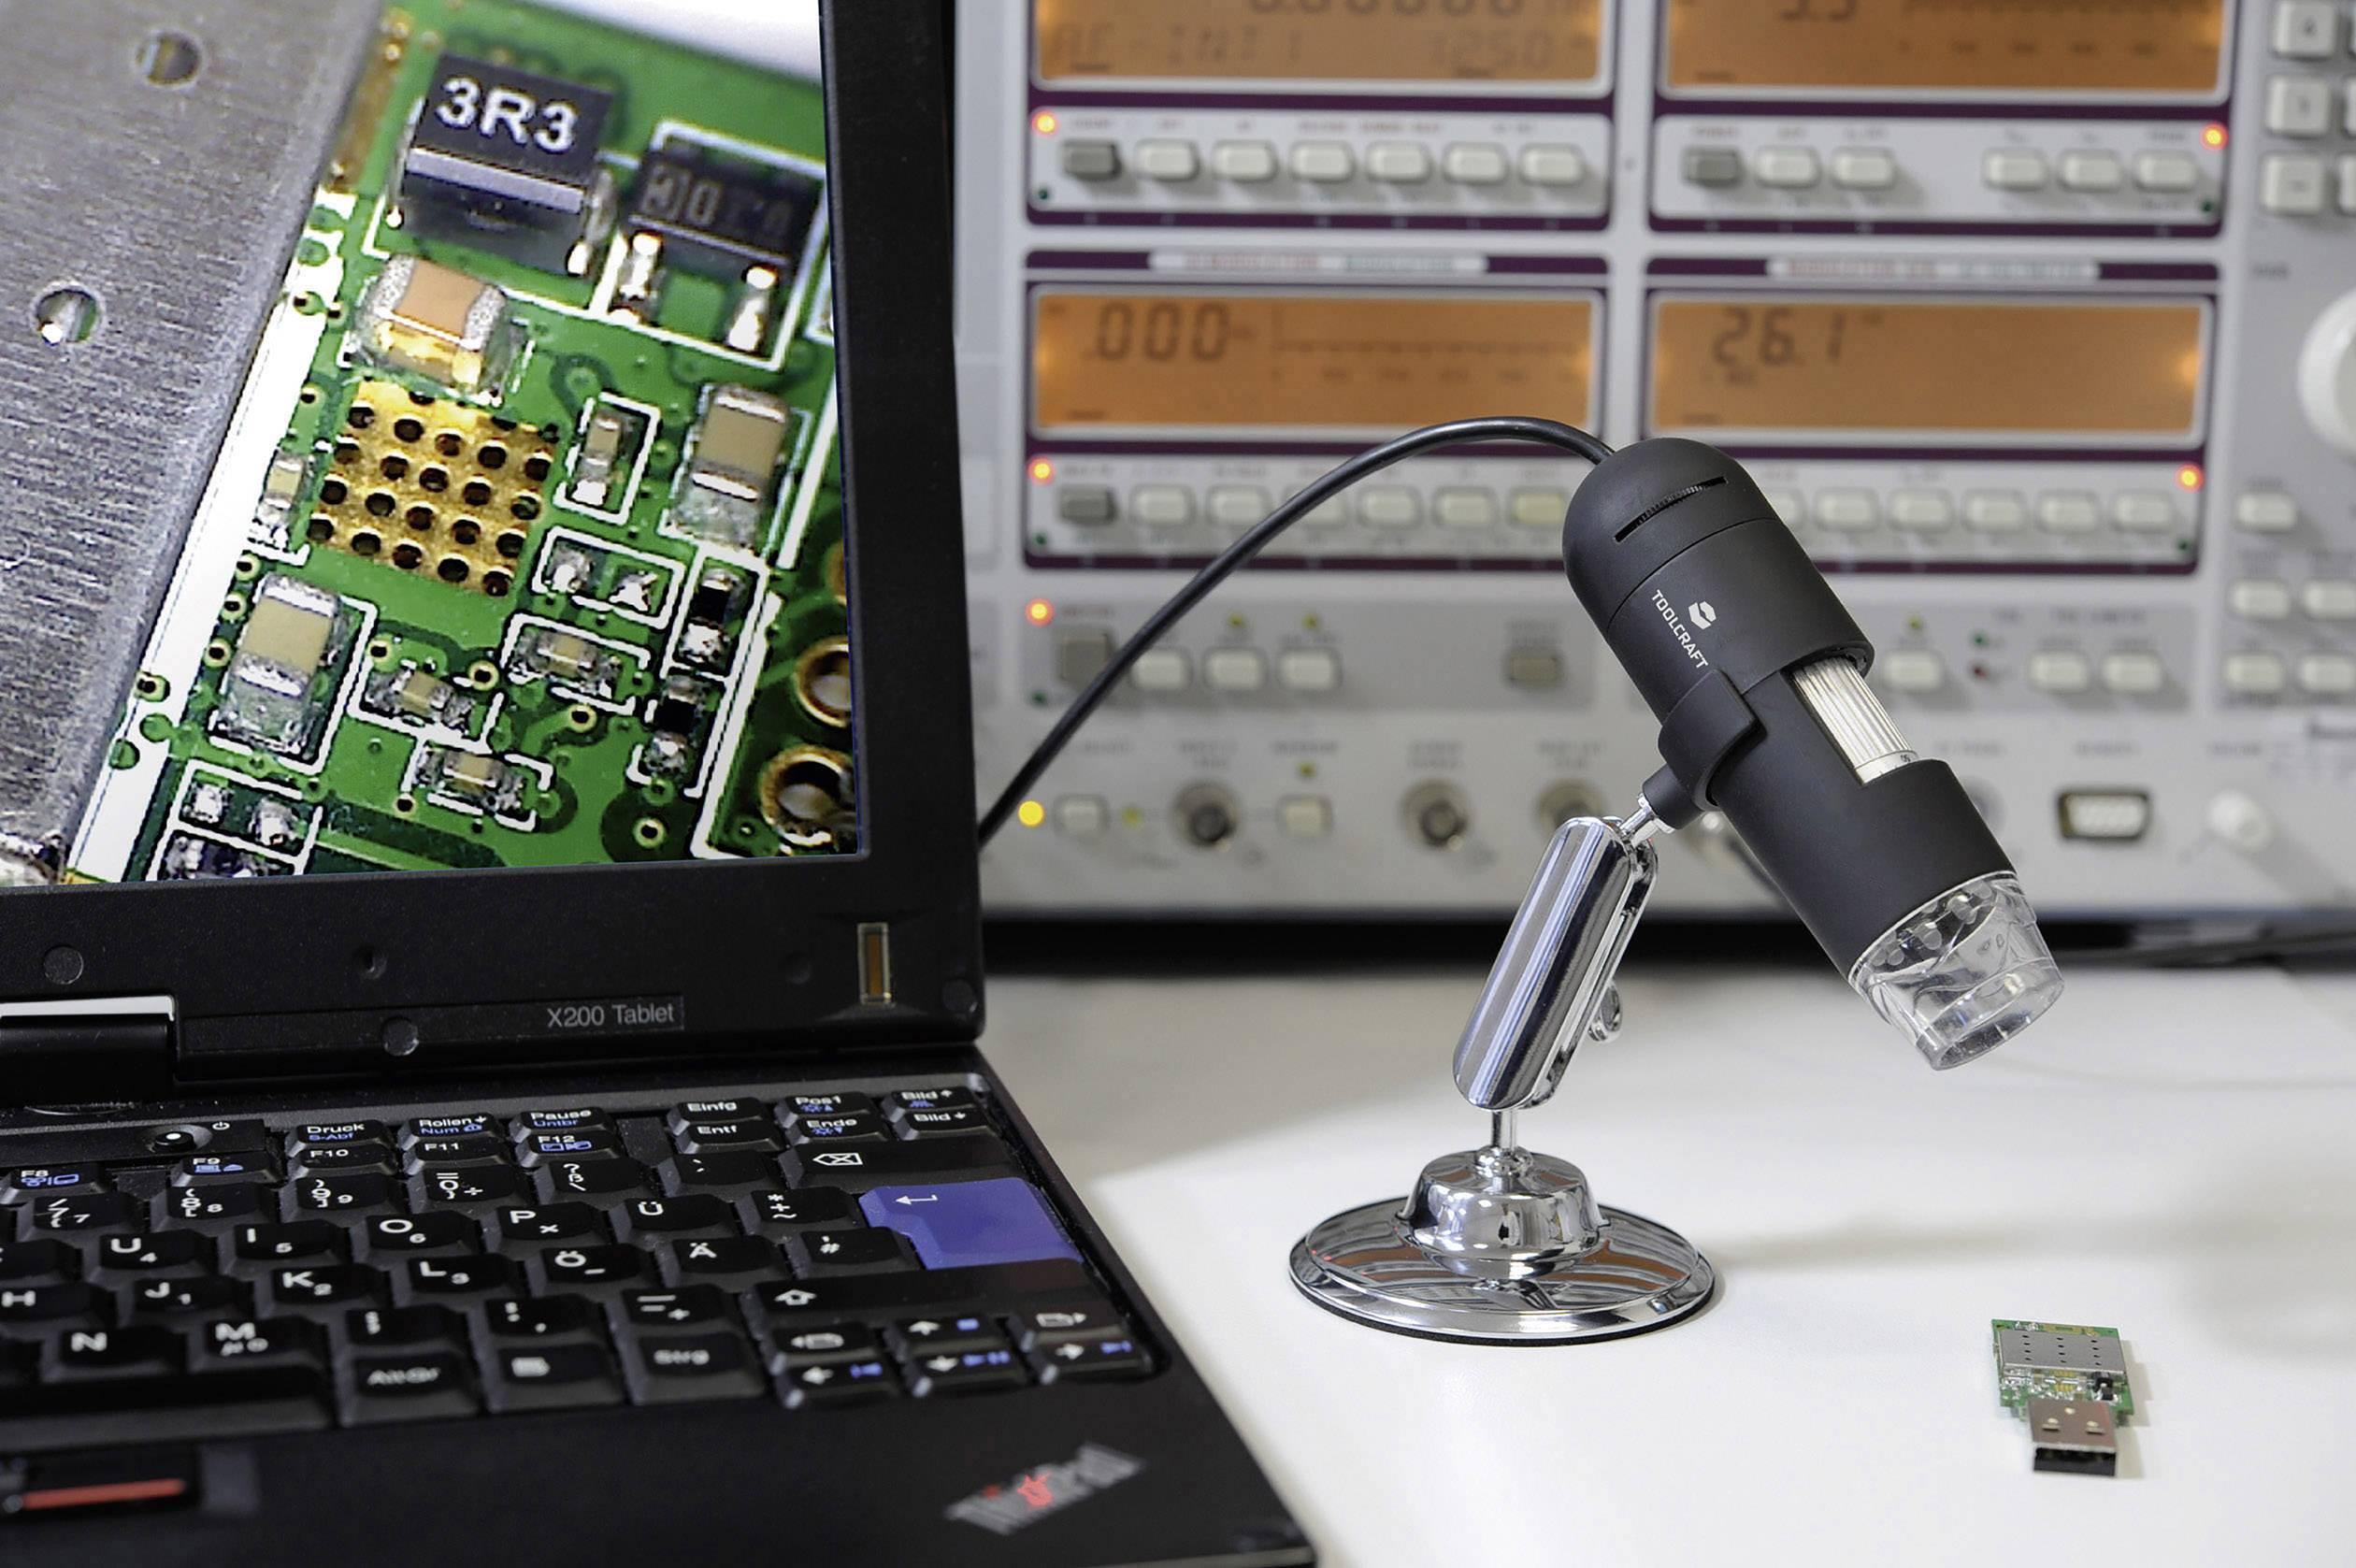 Toolcraft usb mikroskop mio pixel digitale vergrößerung max